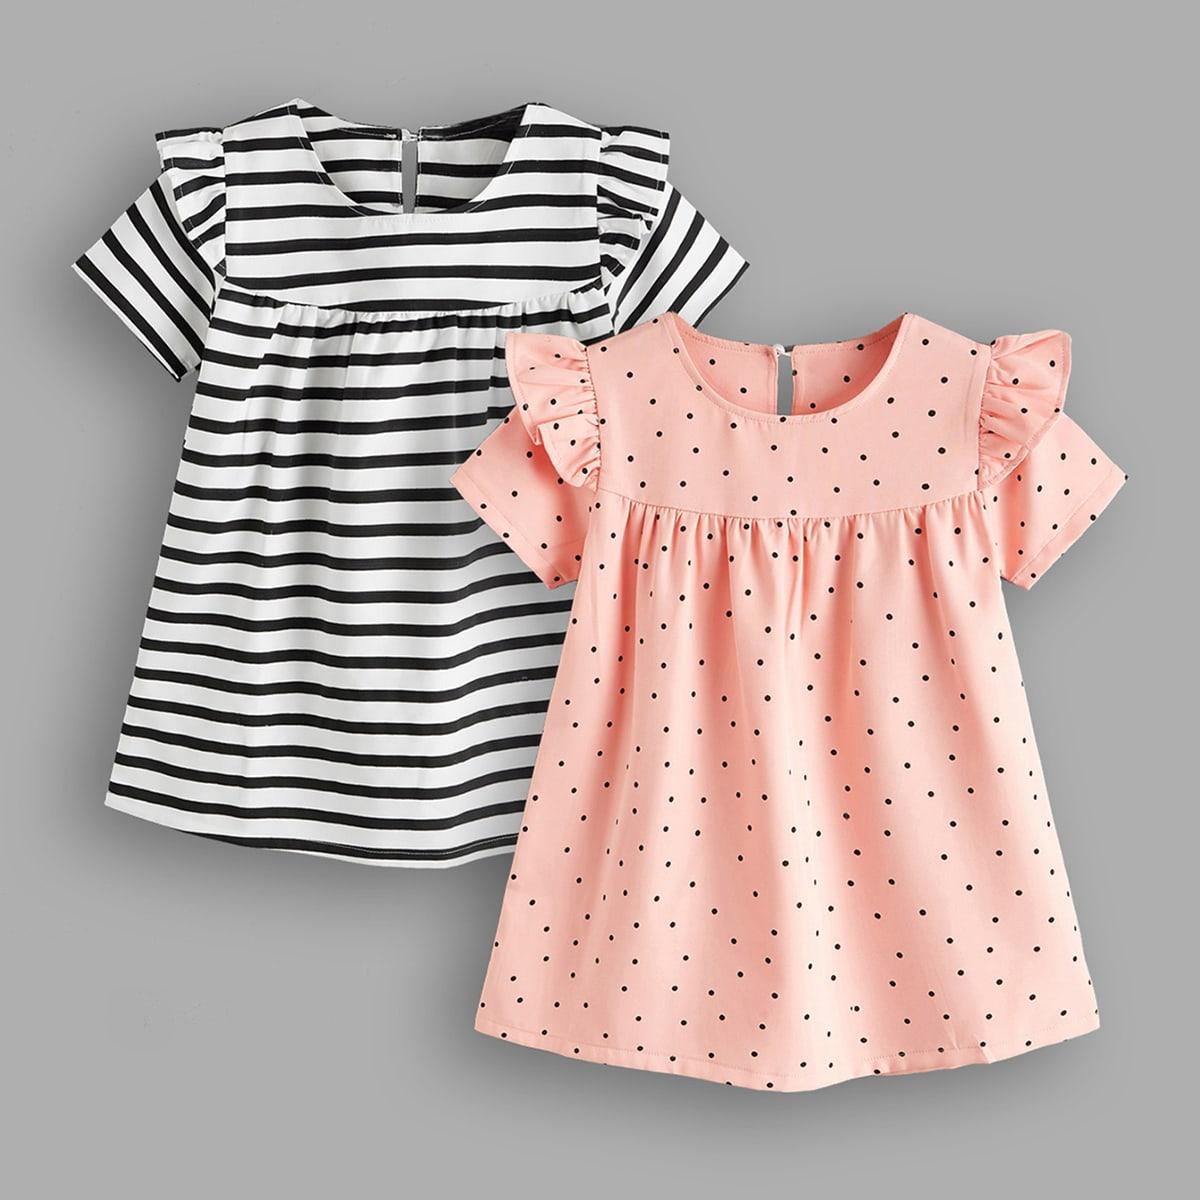 Toddler Girls 2pcs Striped & Polka Dot Ruffle Trim Dress